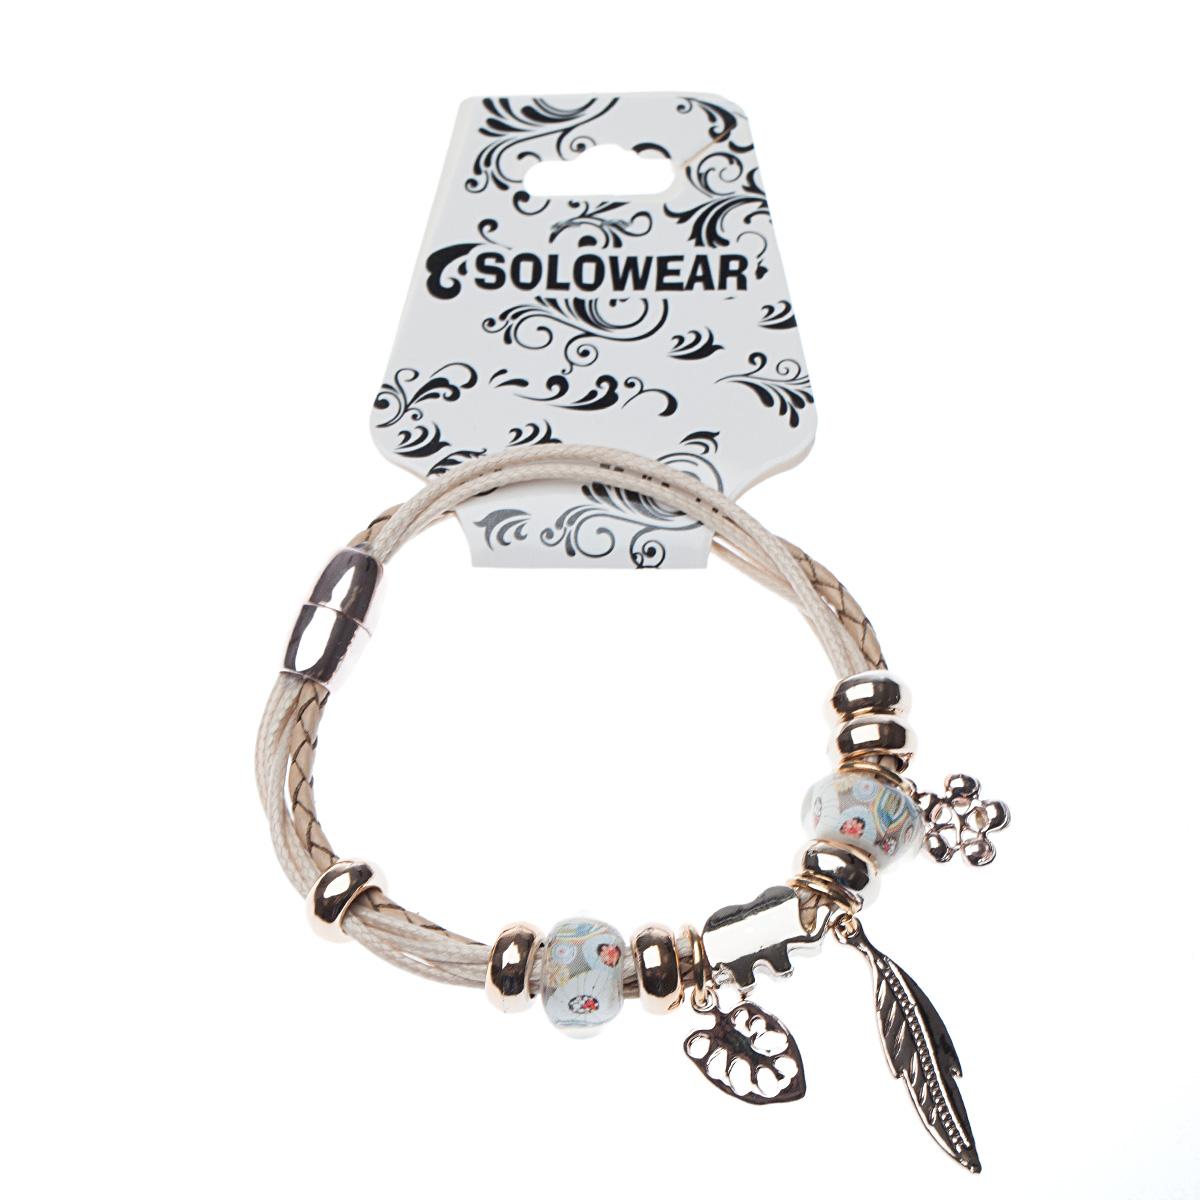 Браслет Solowear, 4620-19 браслет solowear 4620 7